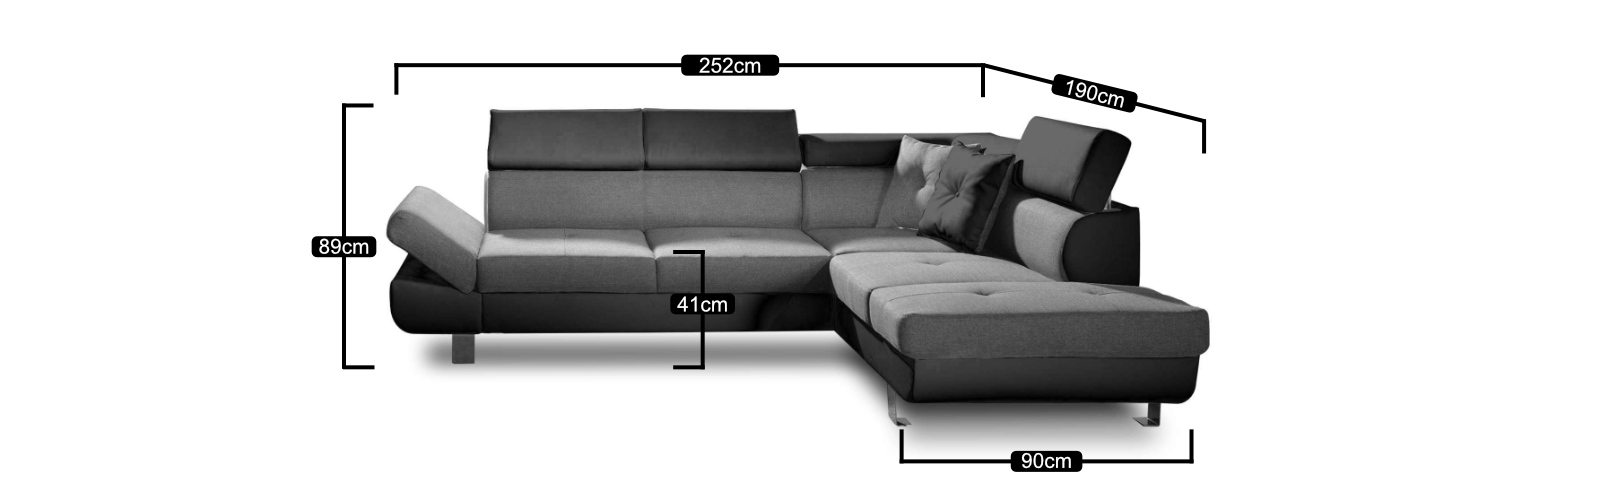 Les dimensions du canapé d'angle gauche Lisbona